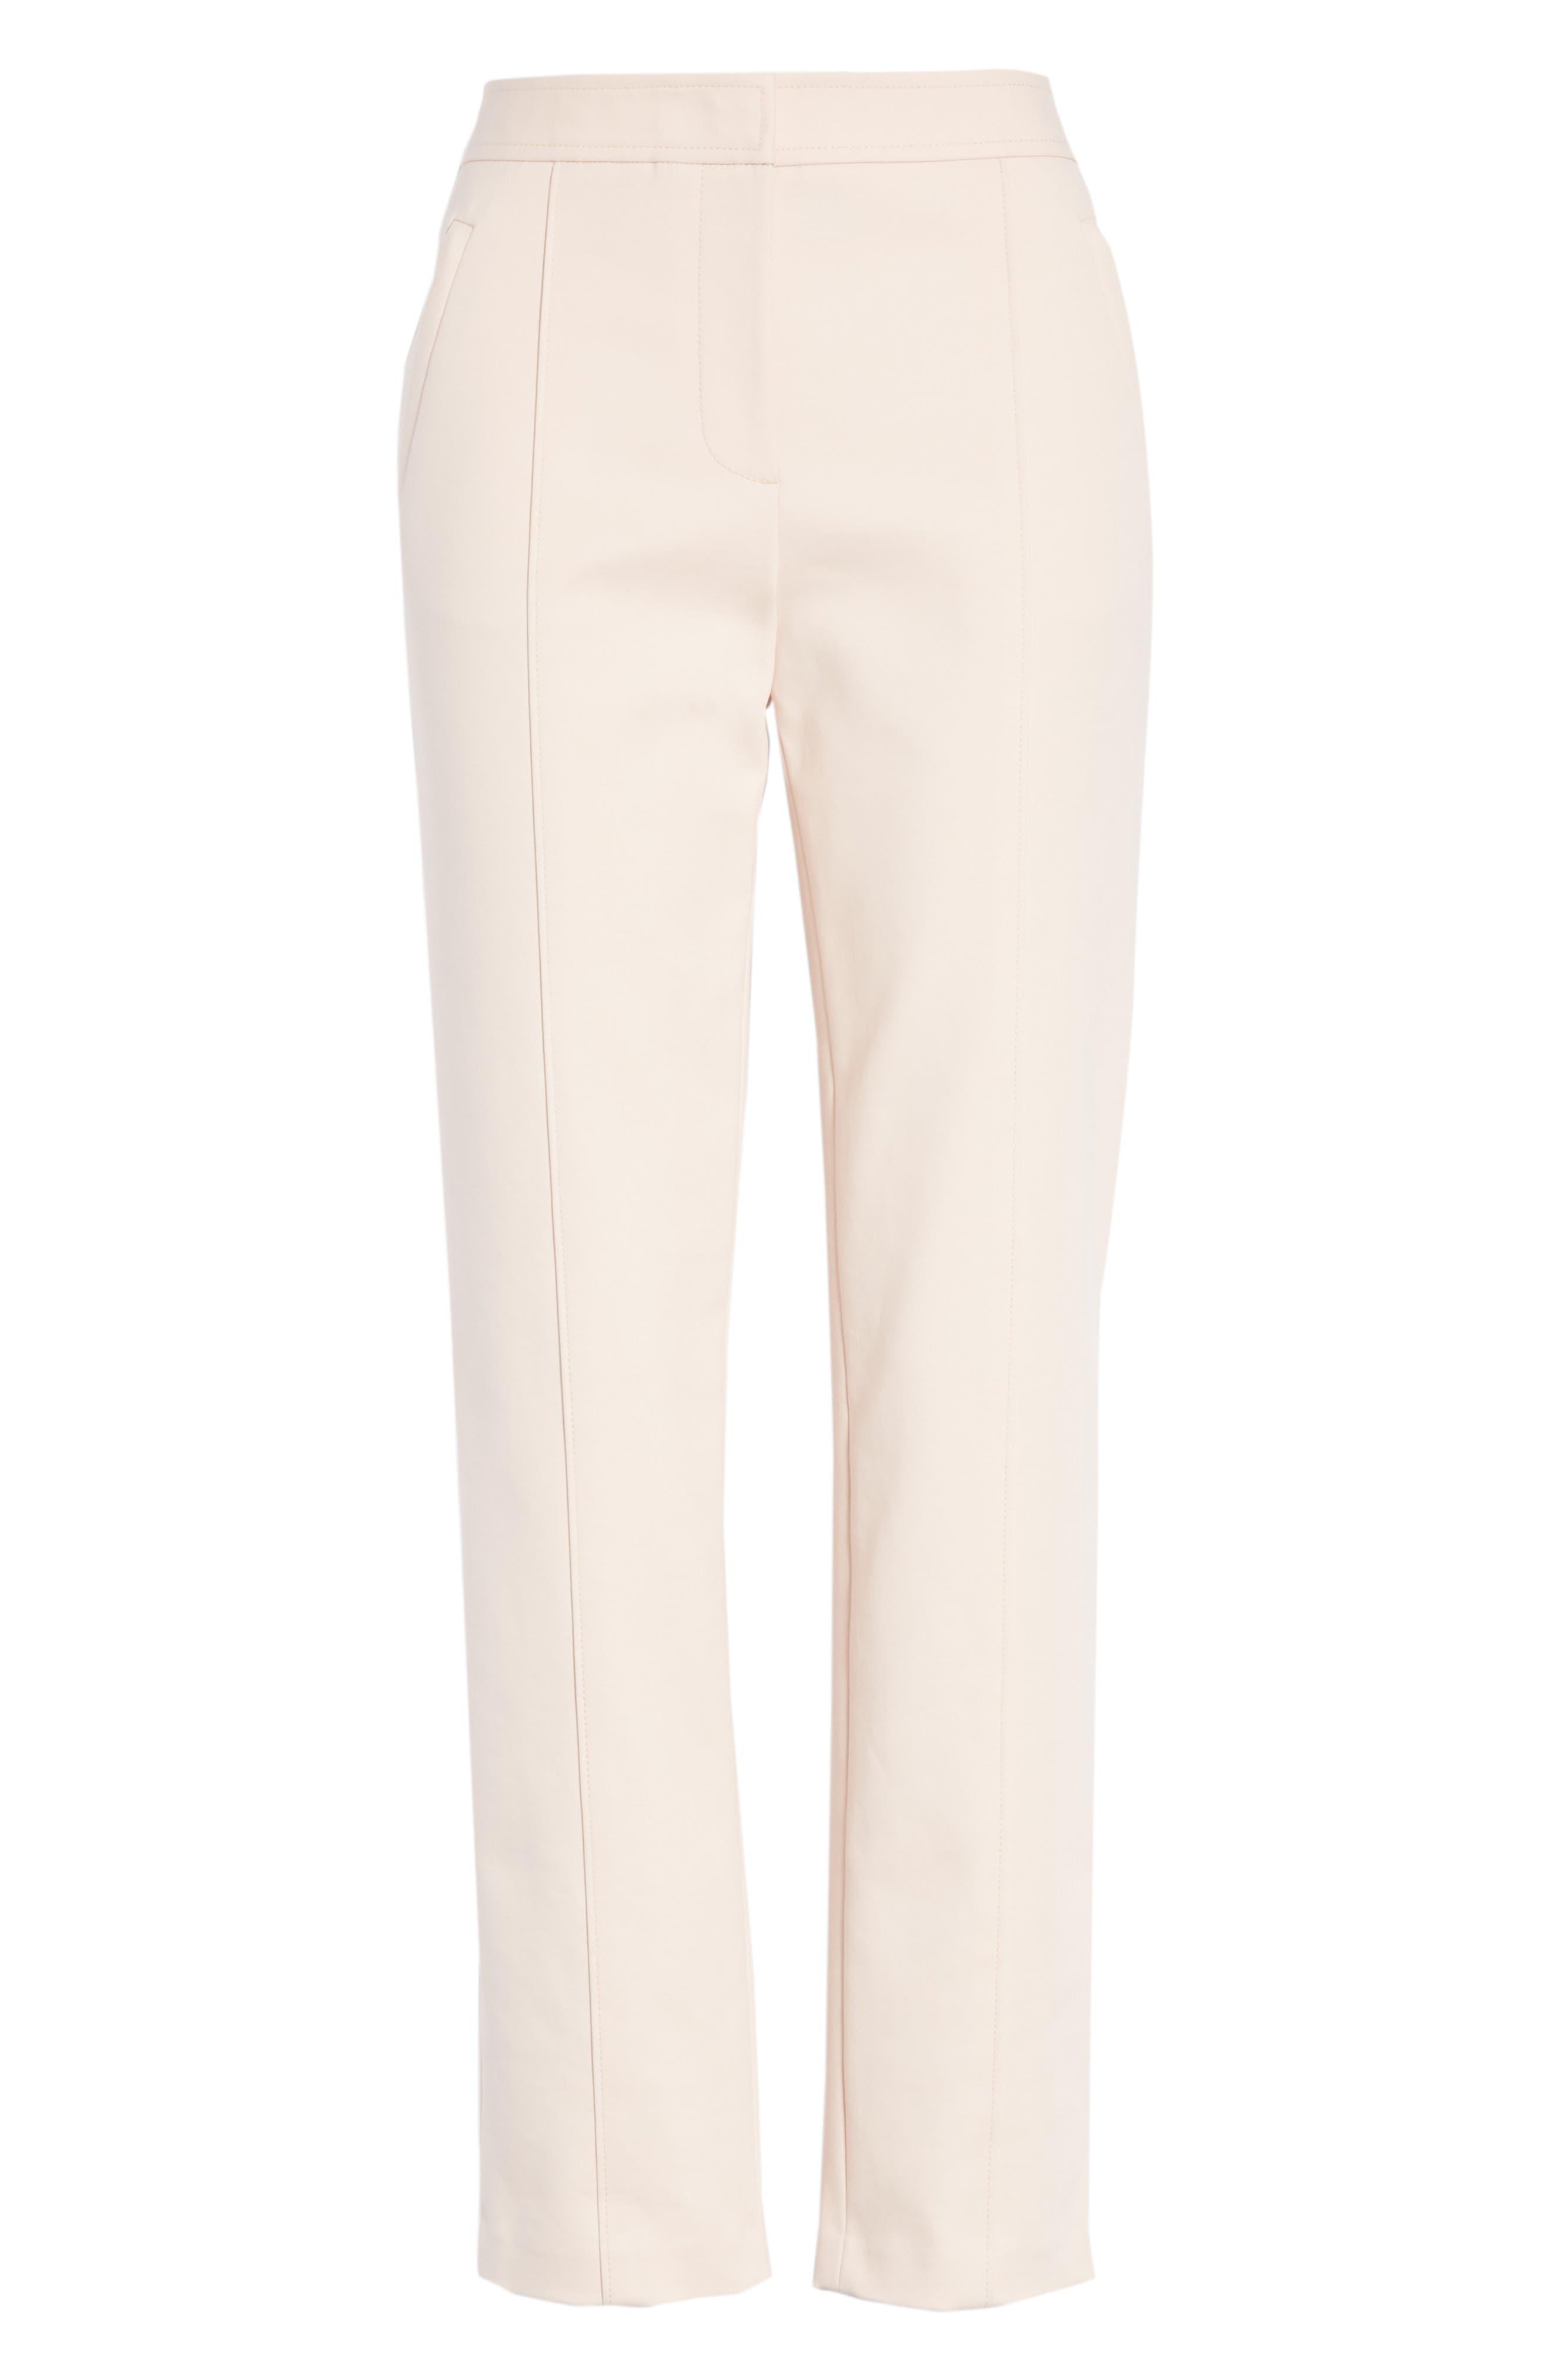 Vanner Slim Leg Ankle Pants,                             Alternate thumbnail 6, color,                             654